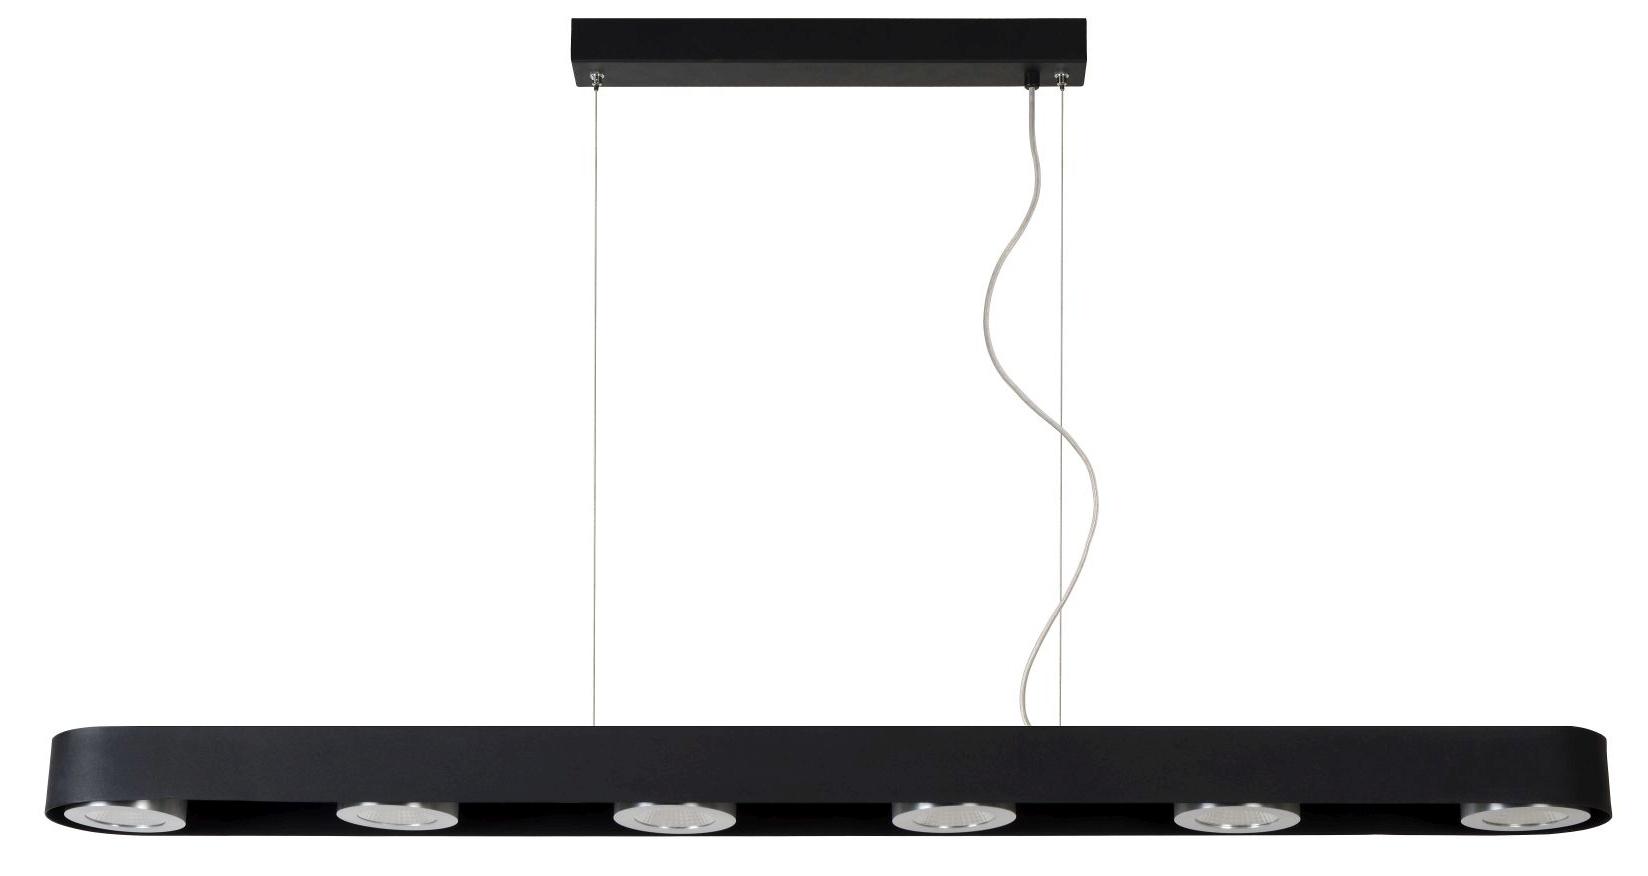 Lucide Verstelbare Hanglamp Radus 6 Lichts - Dimbare LED 5W - Zwart